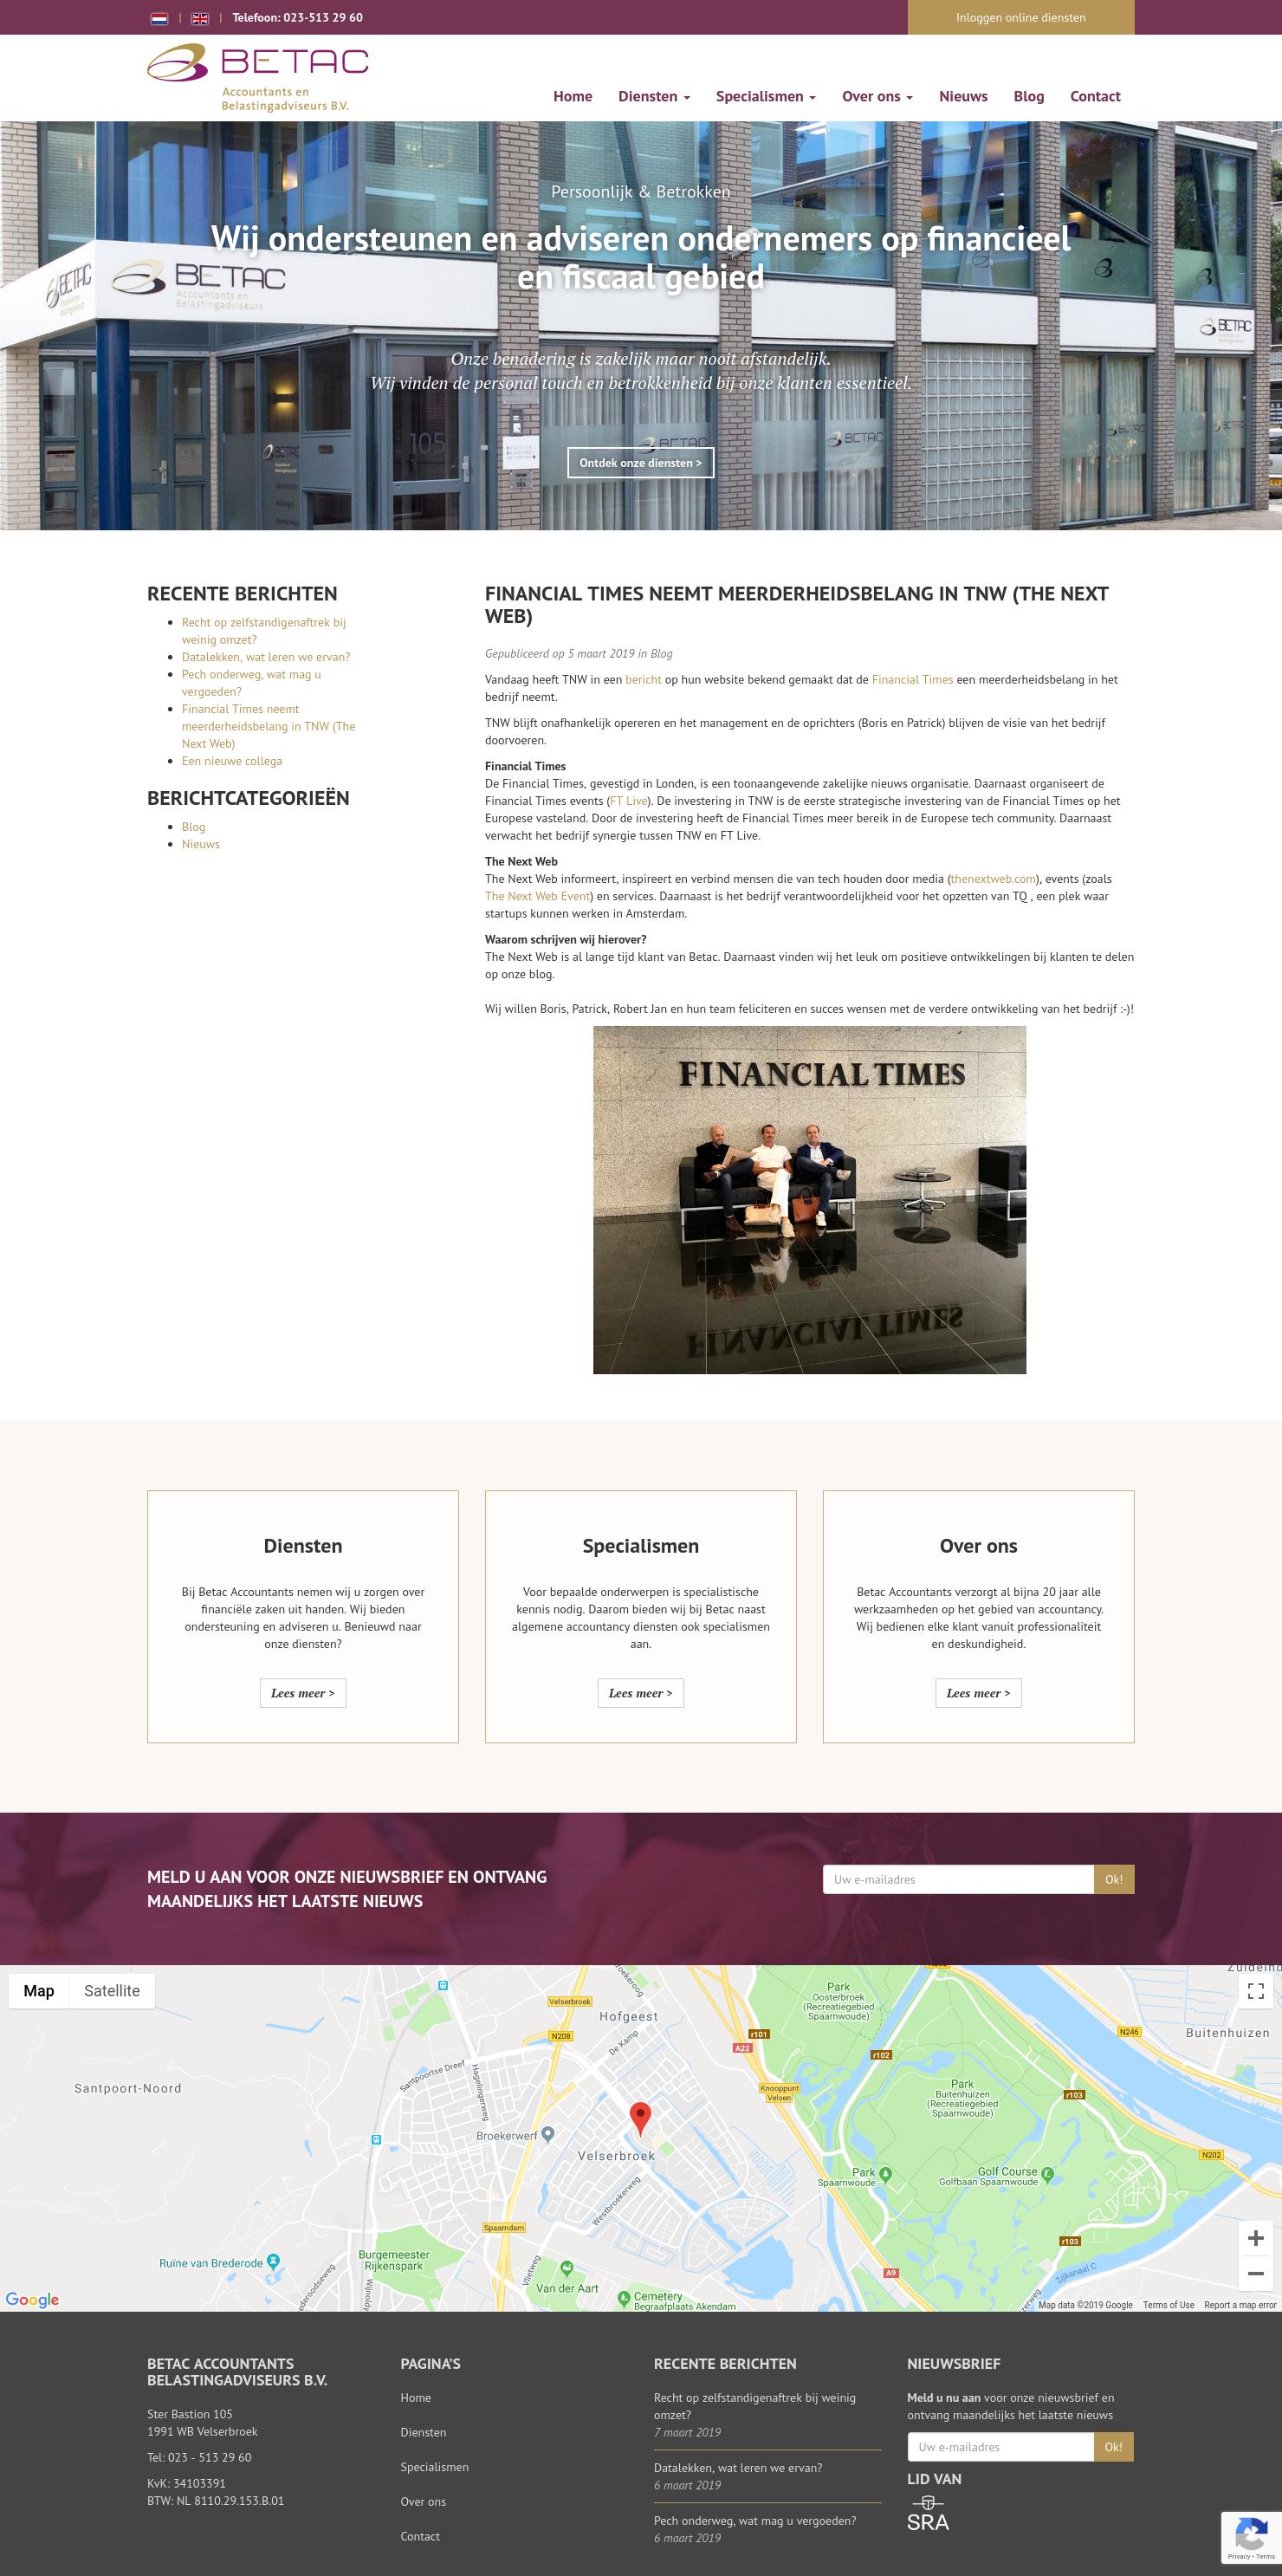 FINANCIAL TIMES NEEMT MEERDERHEIDSBELANG IN TNW (THE NEXT WEB